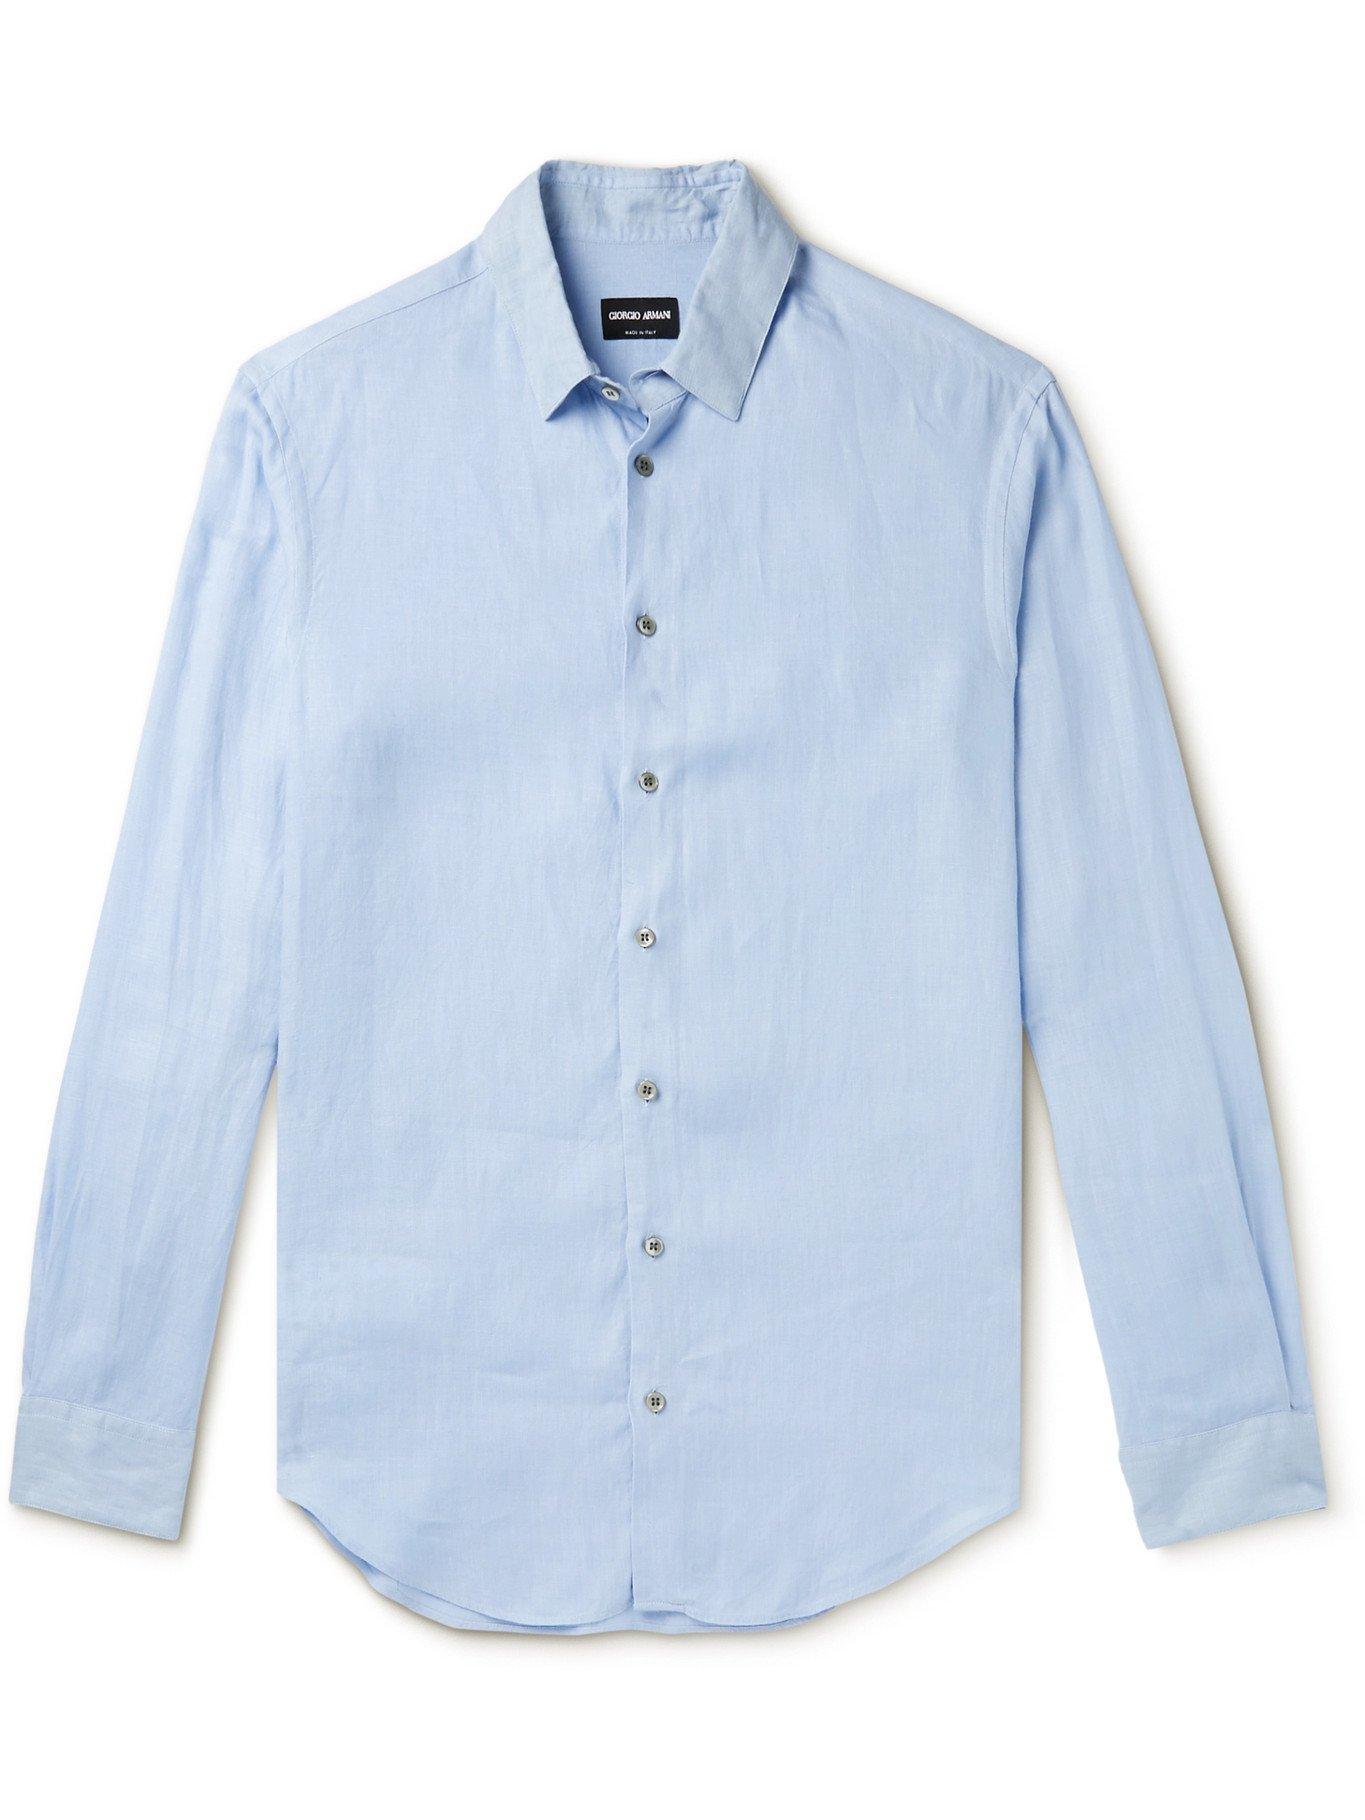 GIORGIO ARMANI - Linen Shirt - Blue